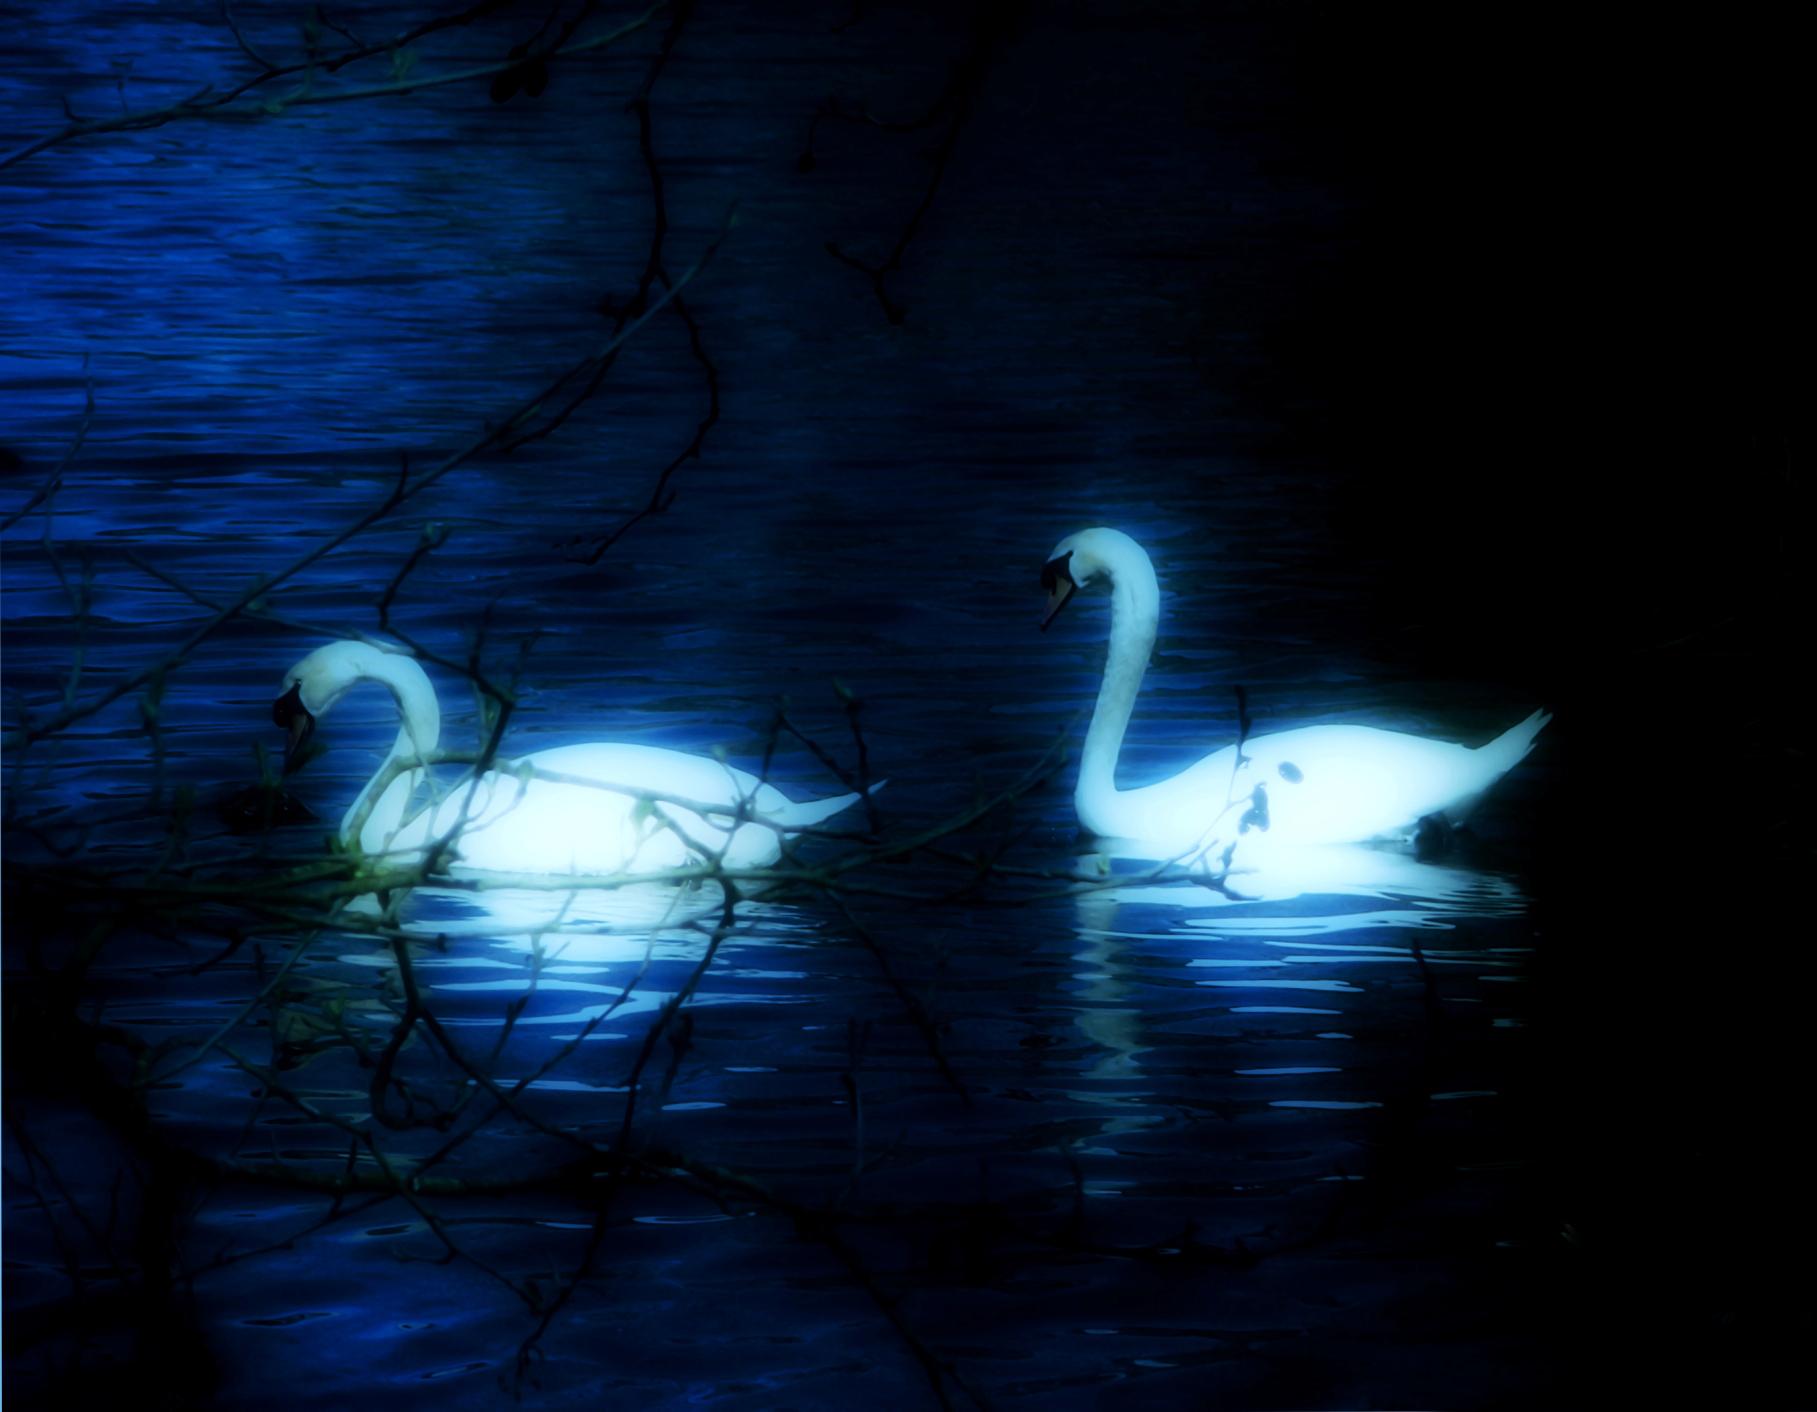 Swan Lake Wallpapers 1817x1412